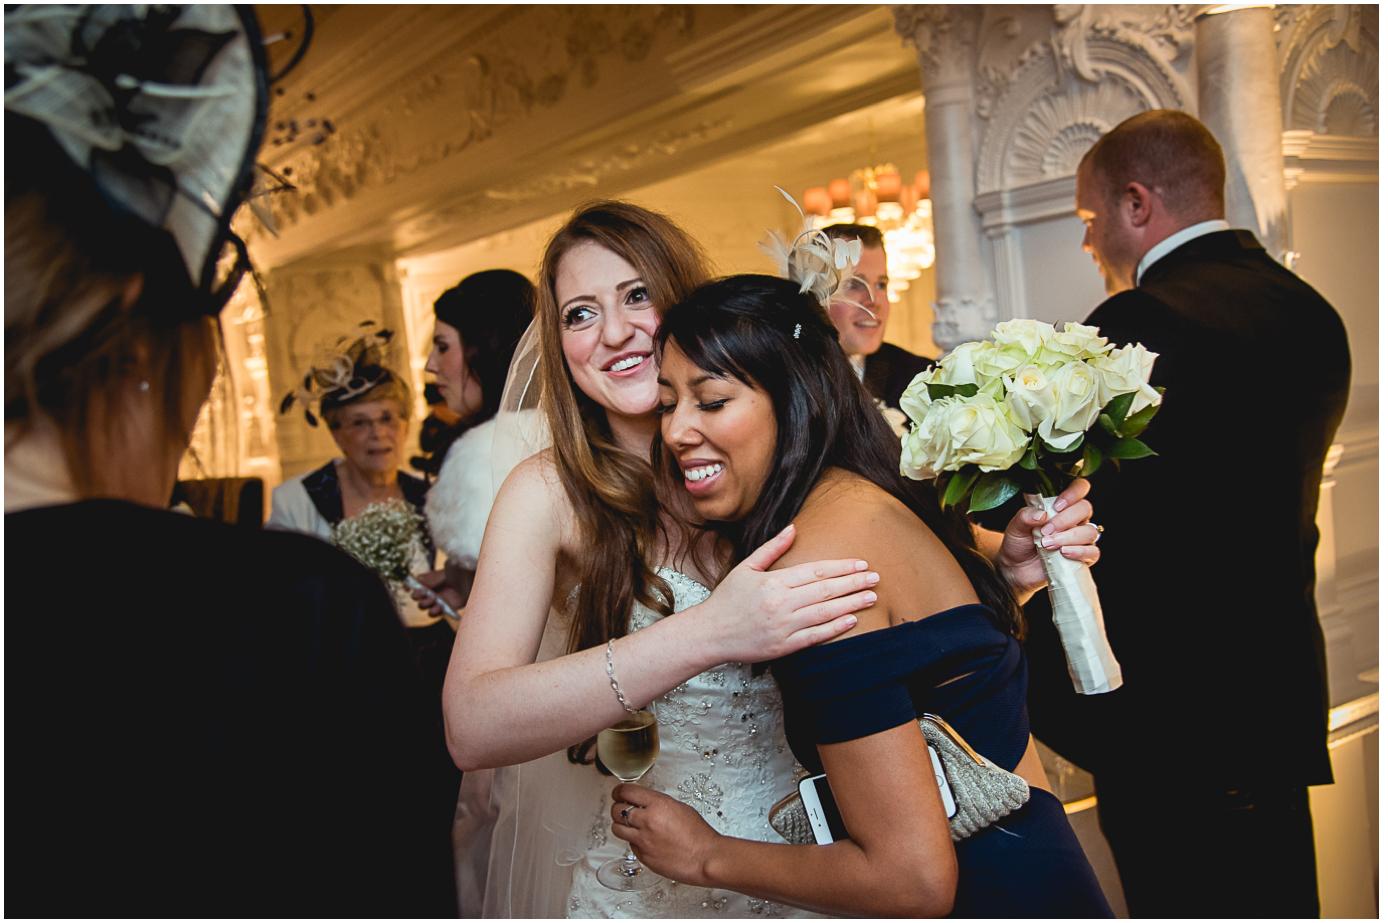 44 - Esmat and Angus - St. Ermin's Hotel London wedding photographer